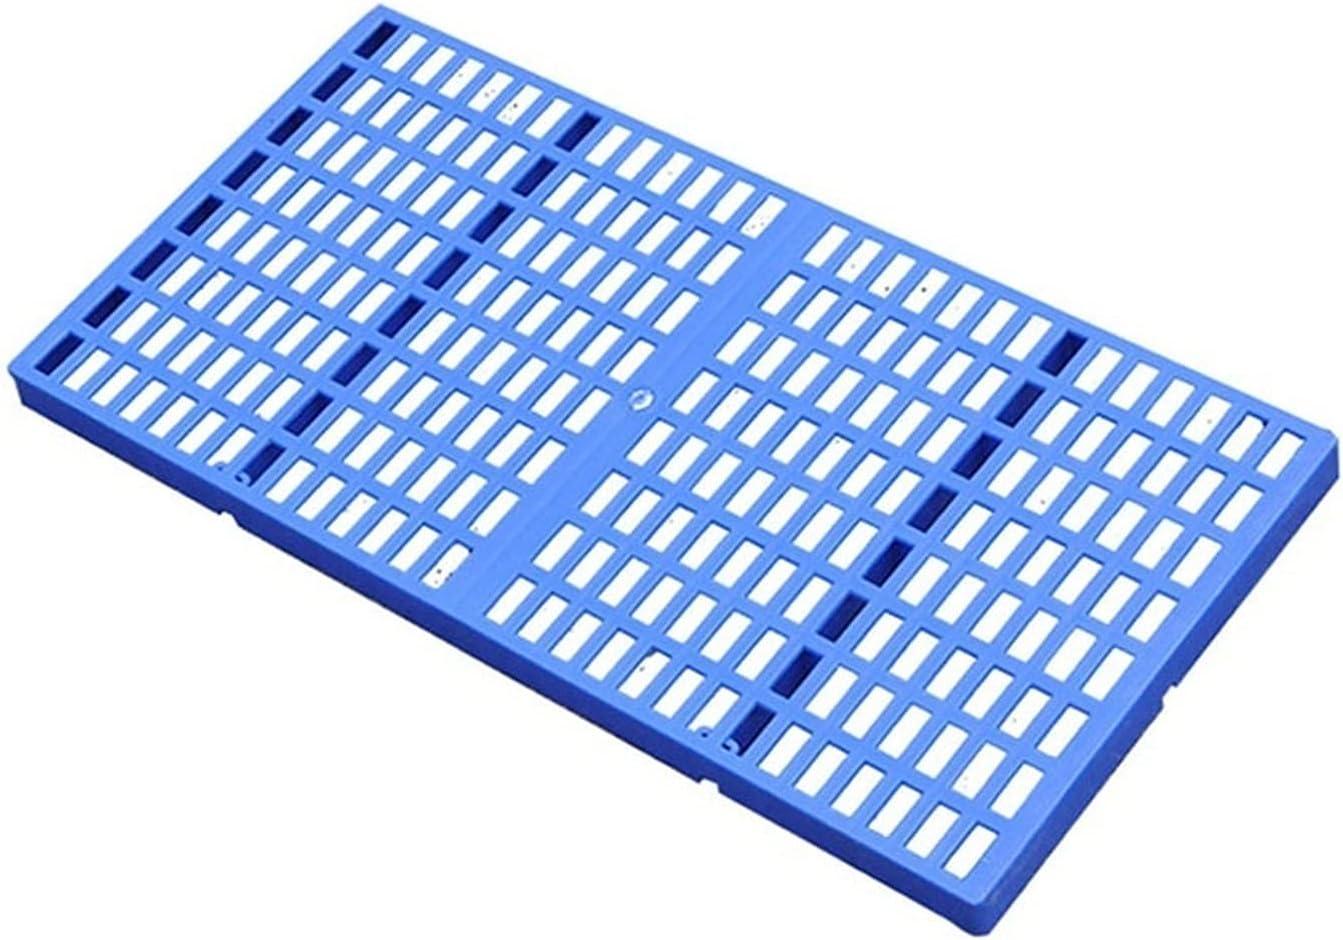 LIANGJUN Storage Racks Plastic Pallet Pallets Ranking TOP17 Storag Baltimore Mall Lightweight